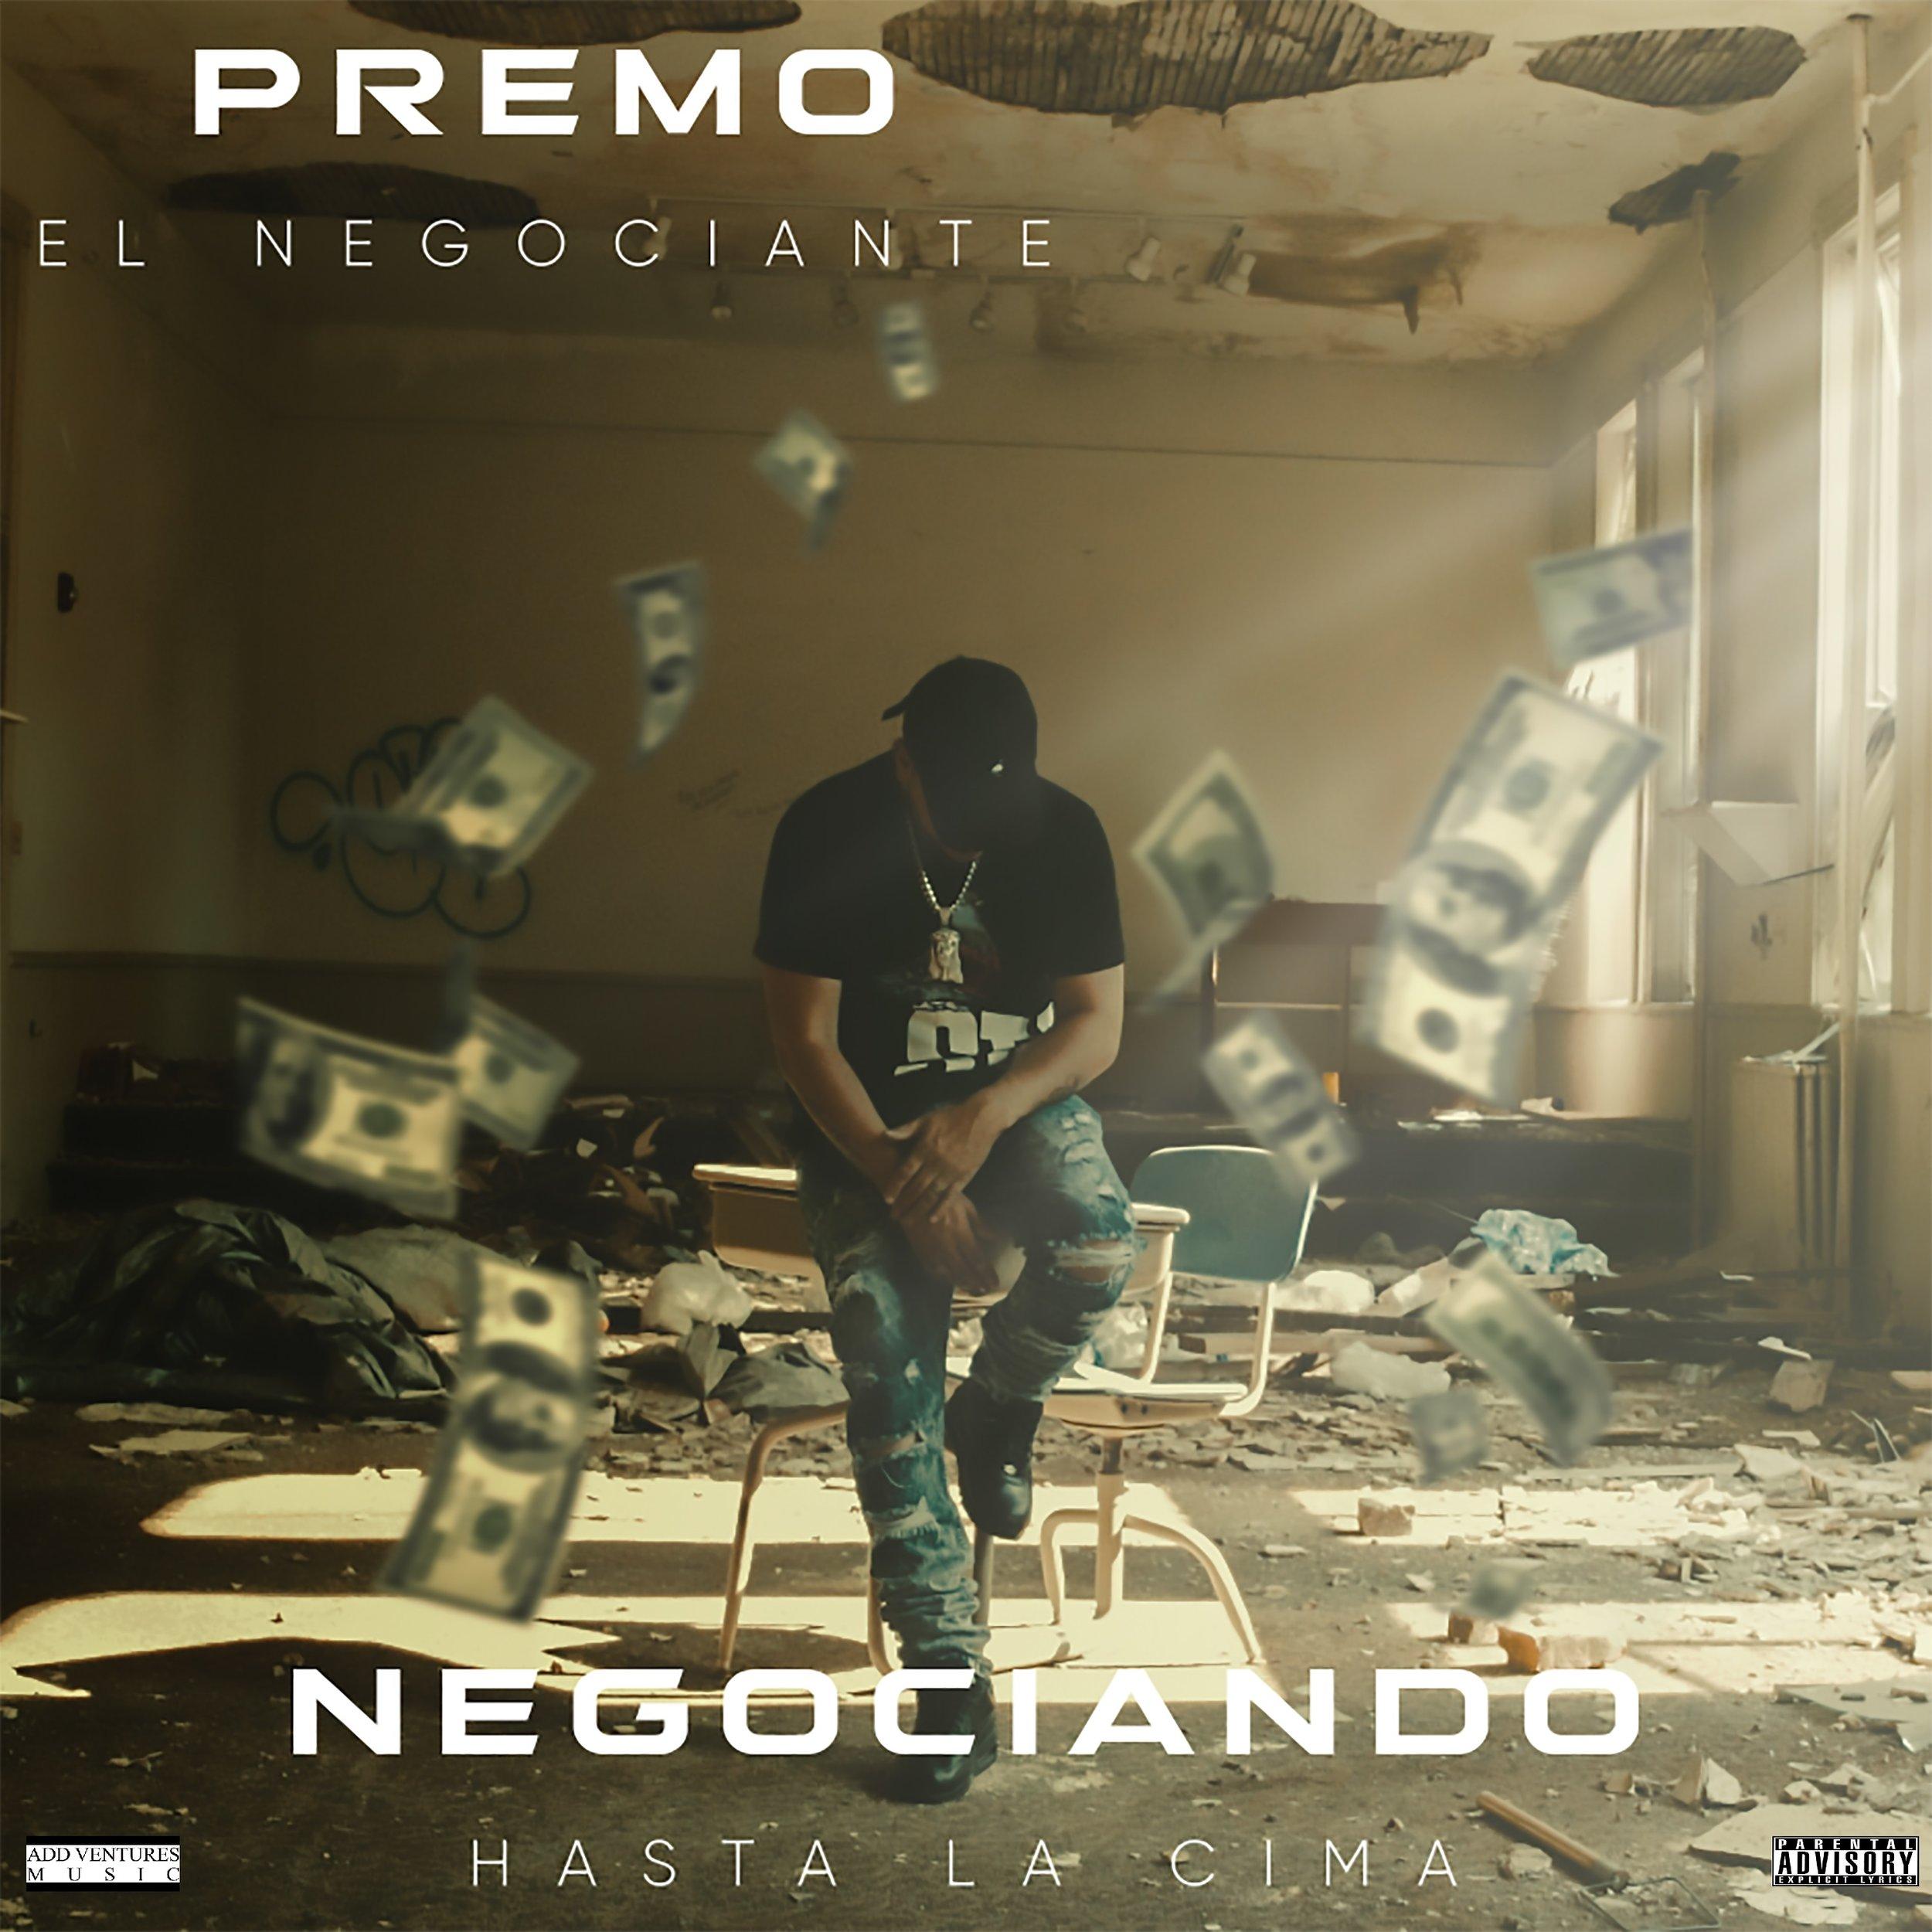 Premo - Negociando Hasta La Cima - Album Cover - Explicit.jpg